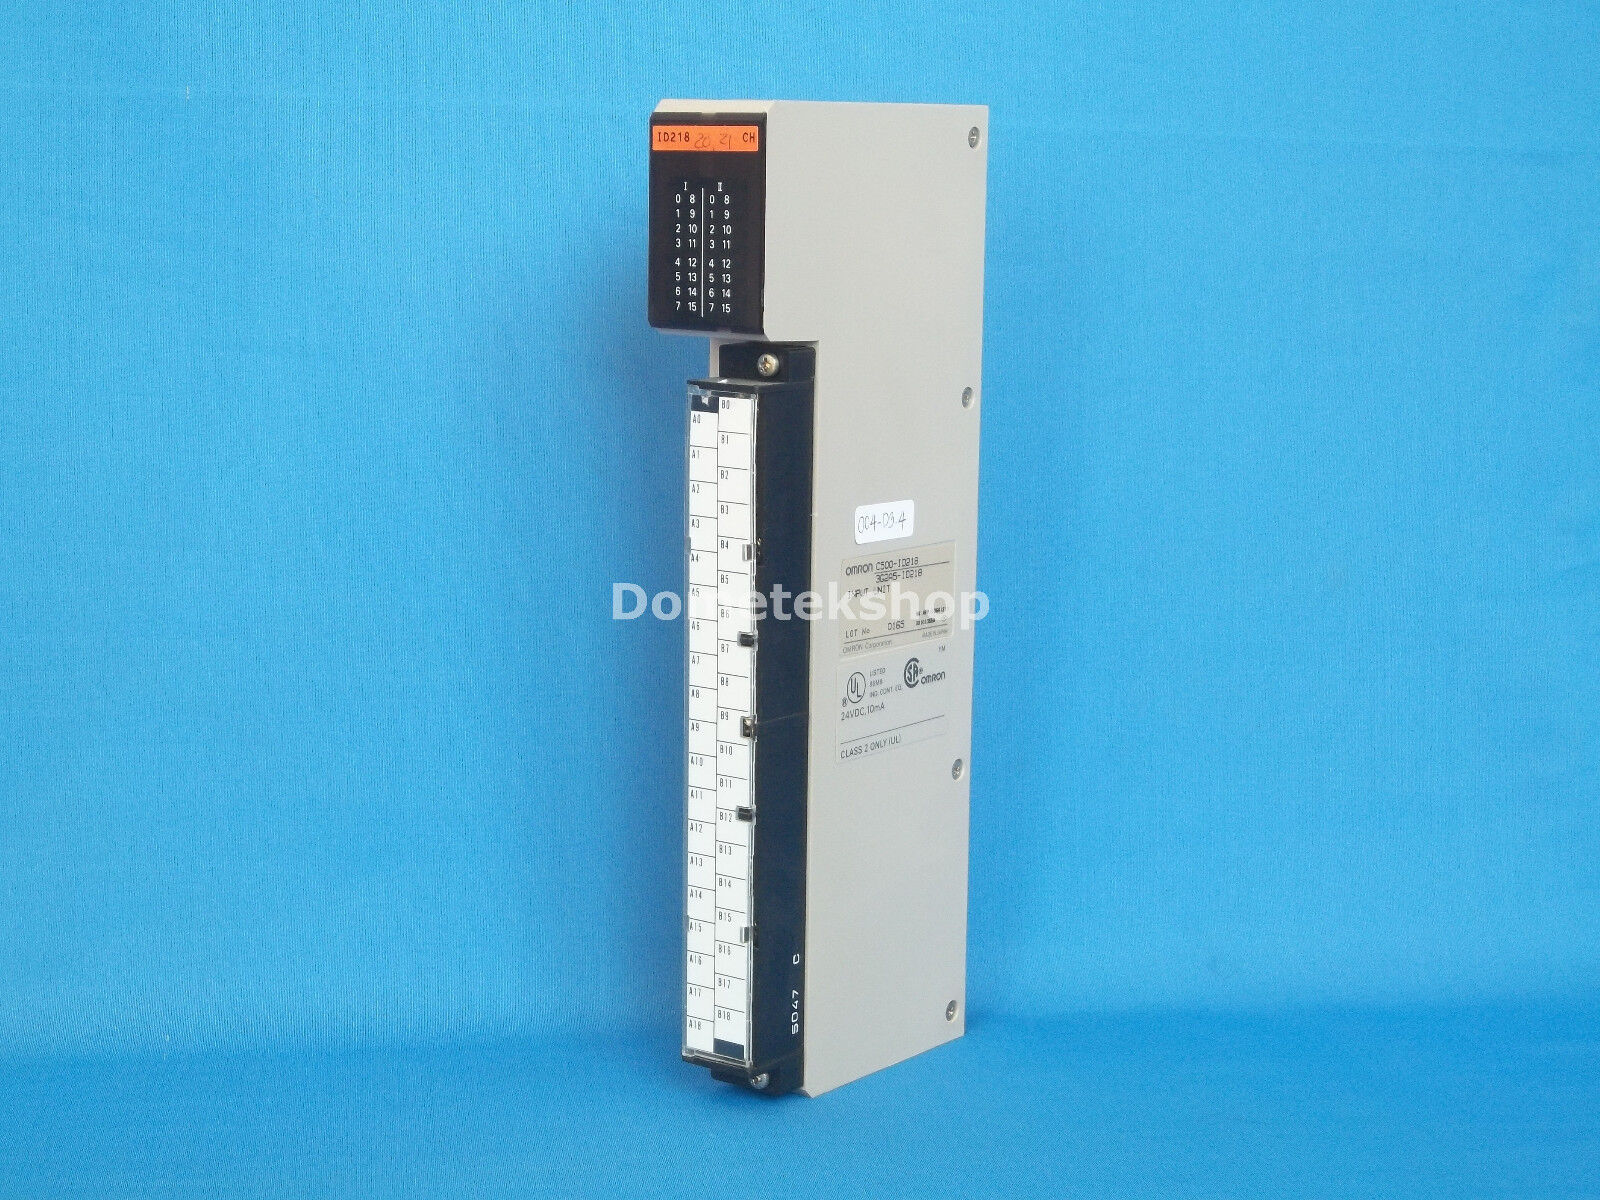 Omron C500-ID218 3G2A5-ID218 Input Unit